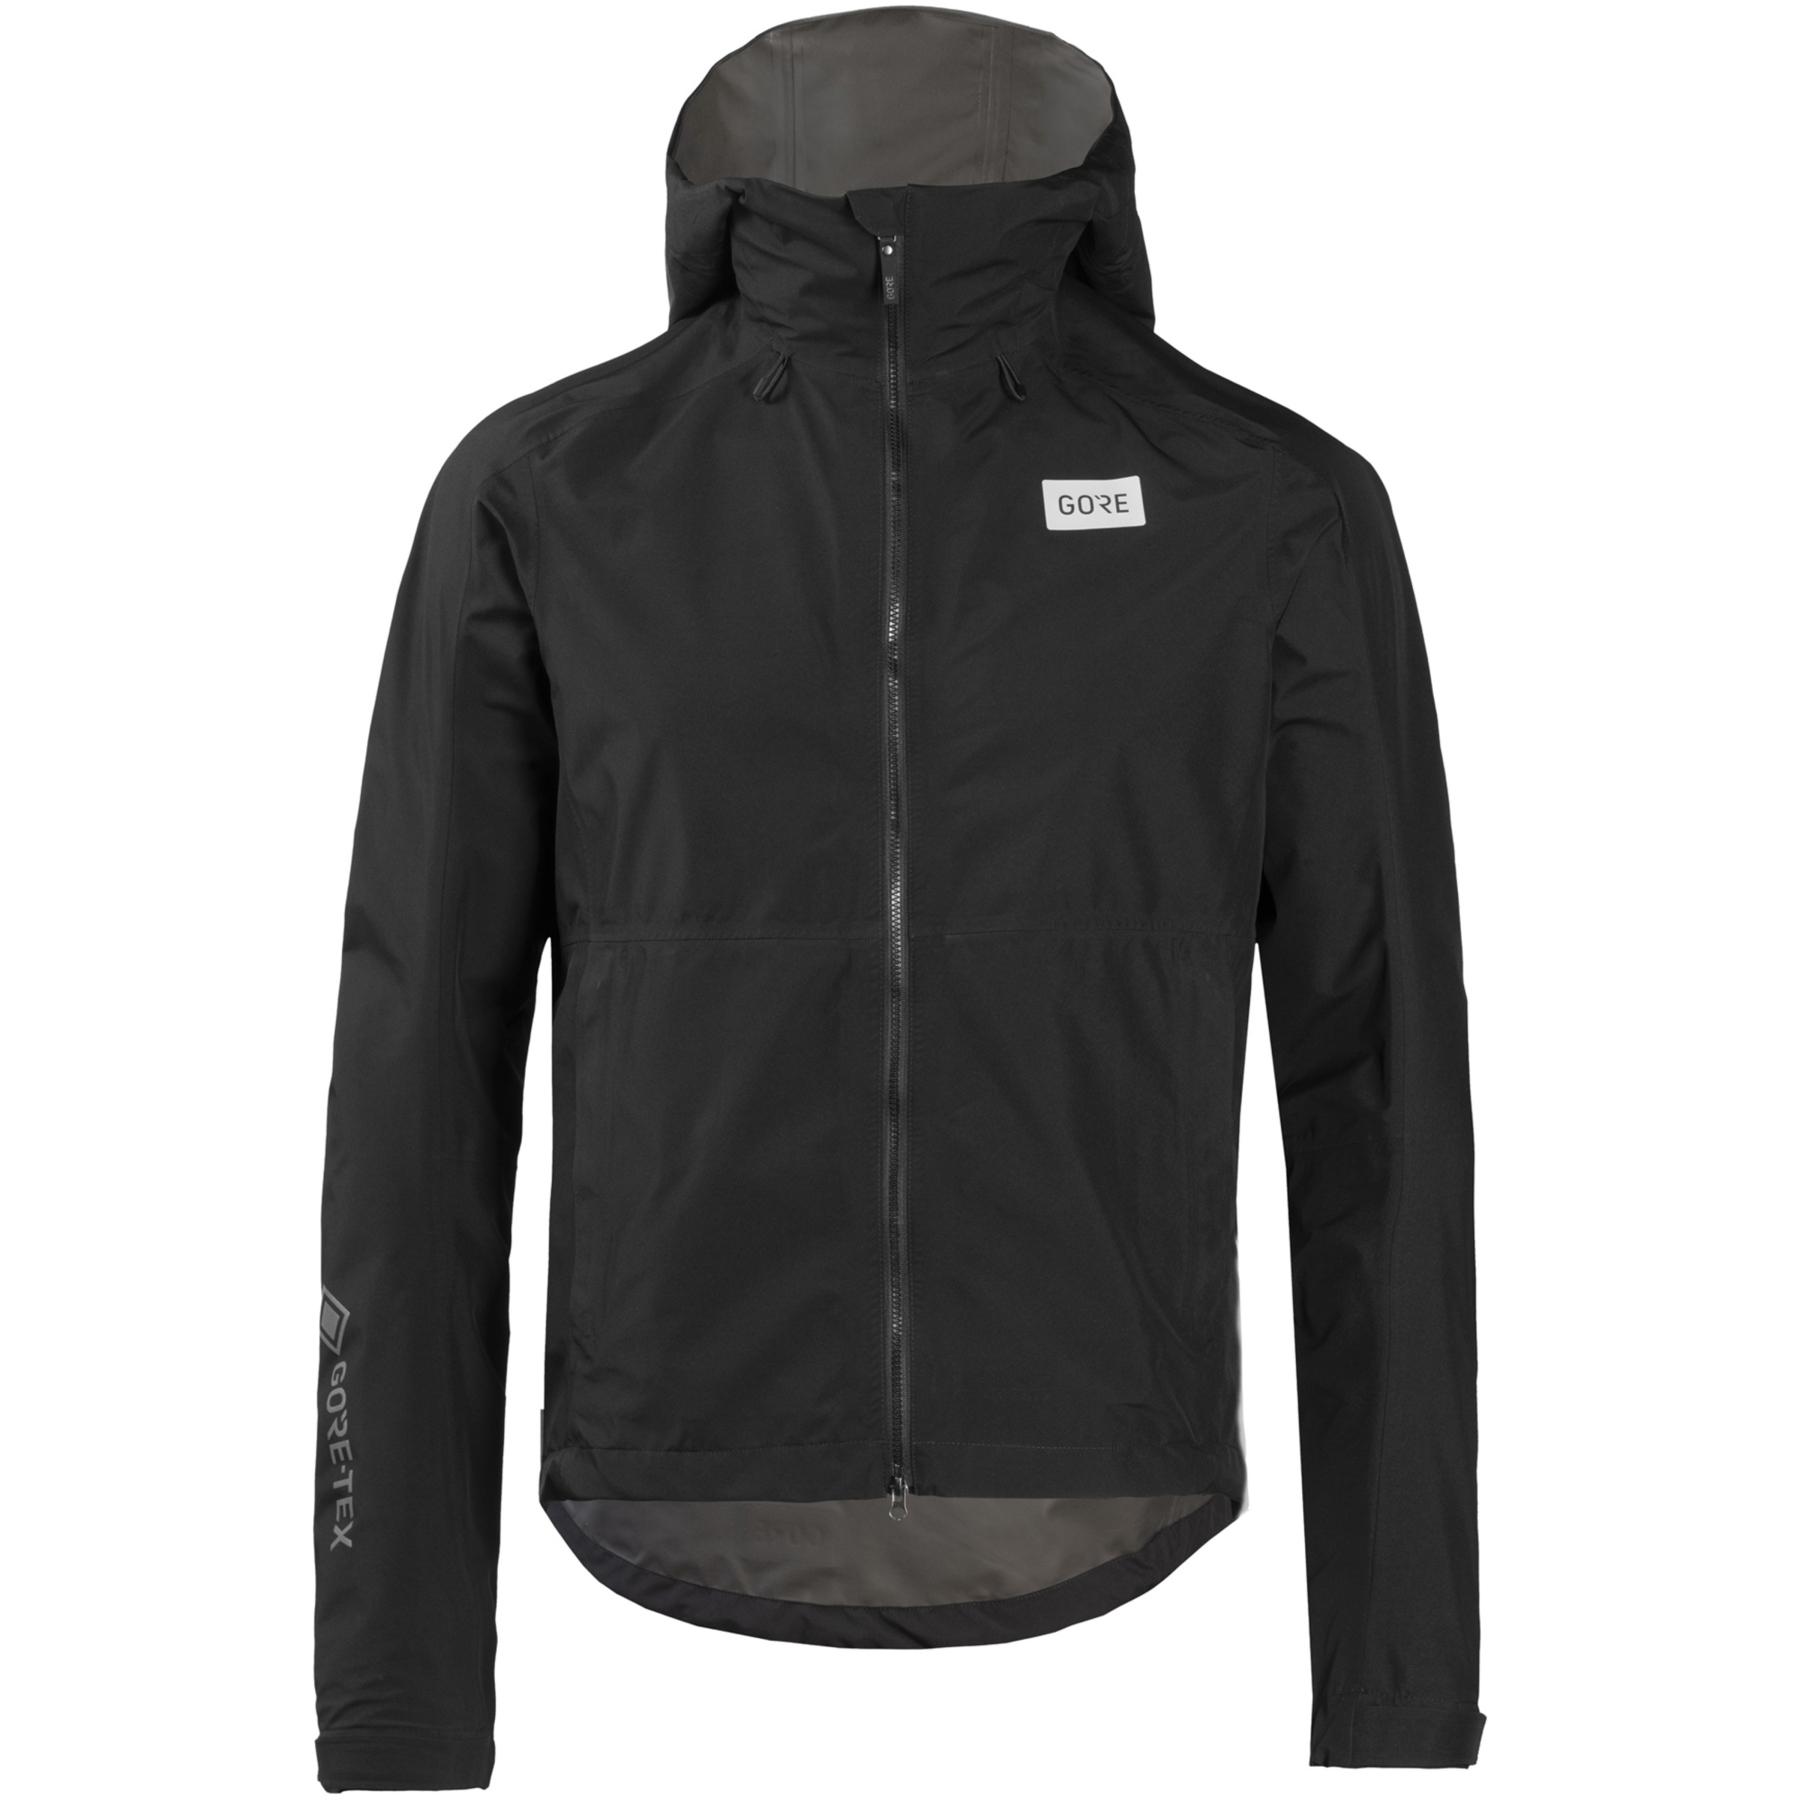 GORE Wear Endure Chaqueta para Hombre - negro 9900